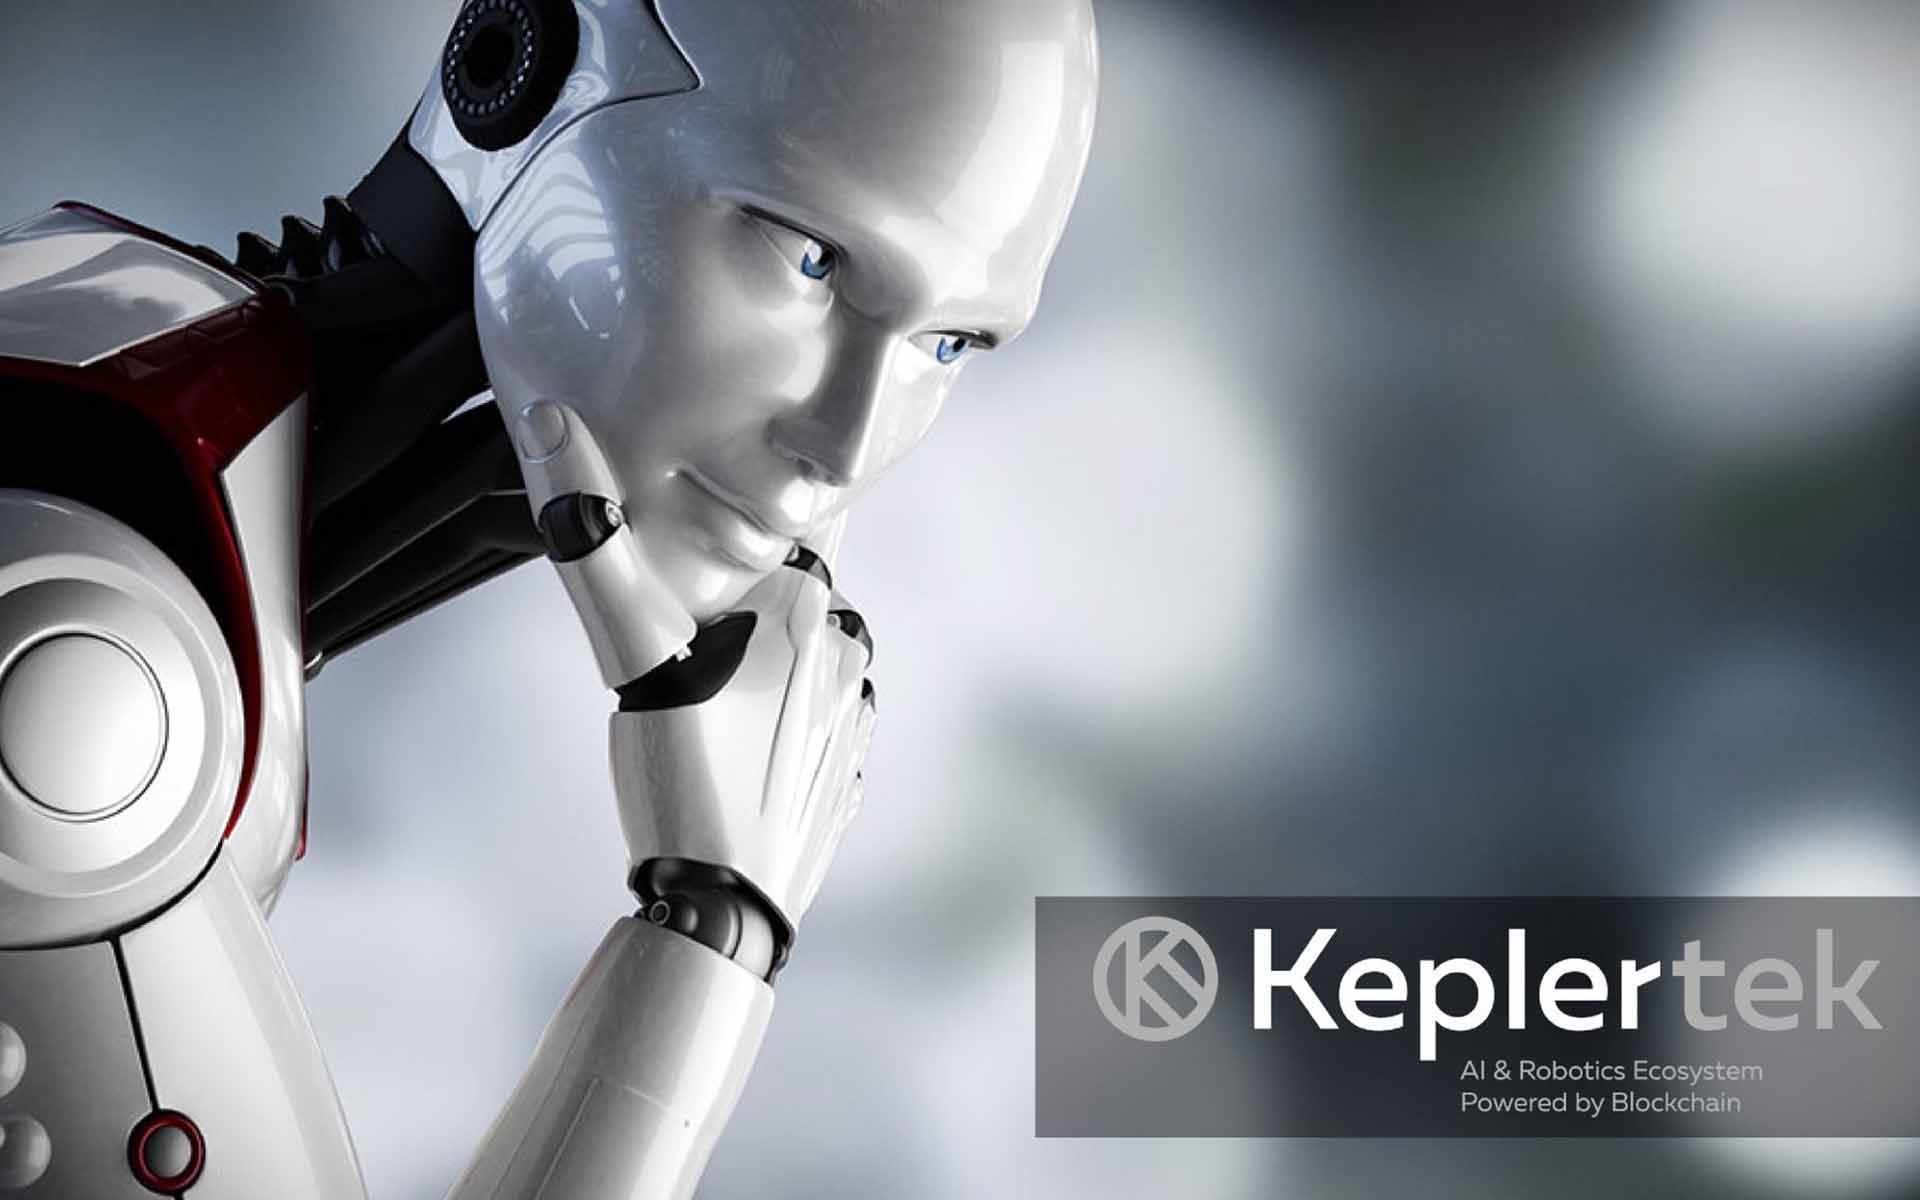 Keplertek: Special Sale Due to Incredible Demand (June 19th-June 21st)